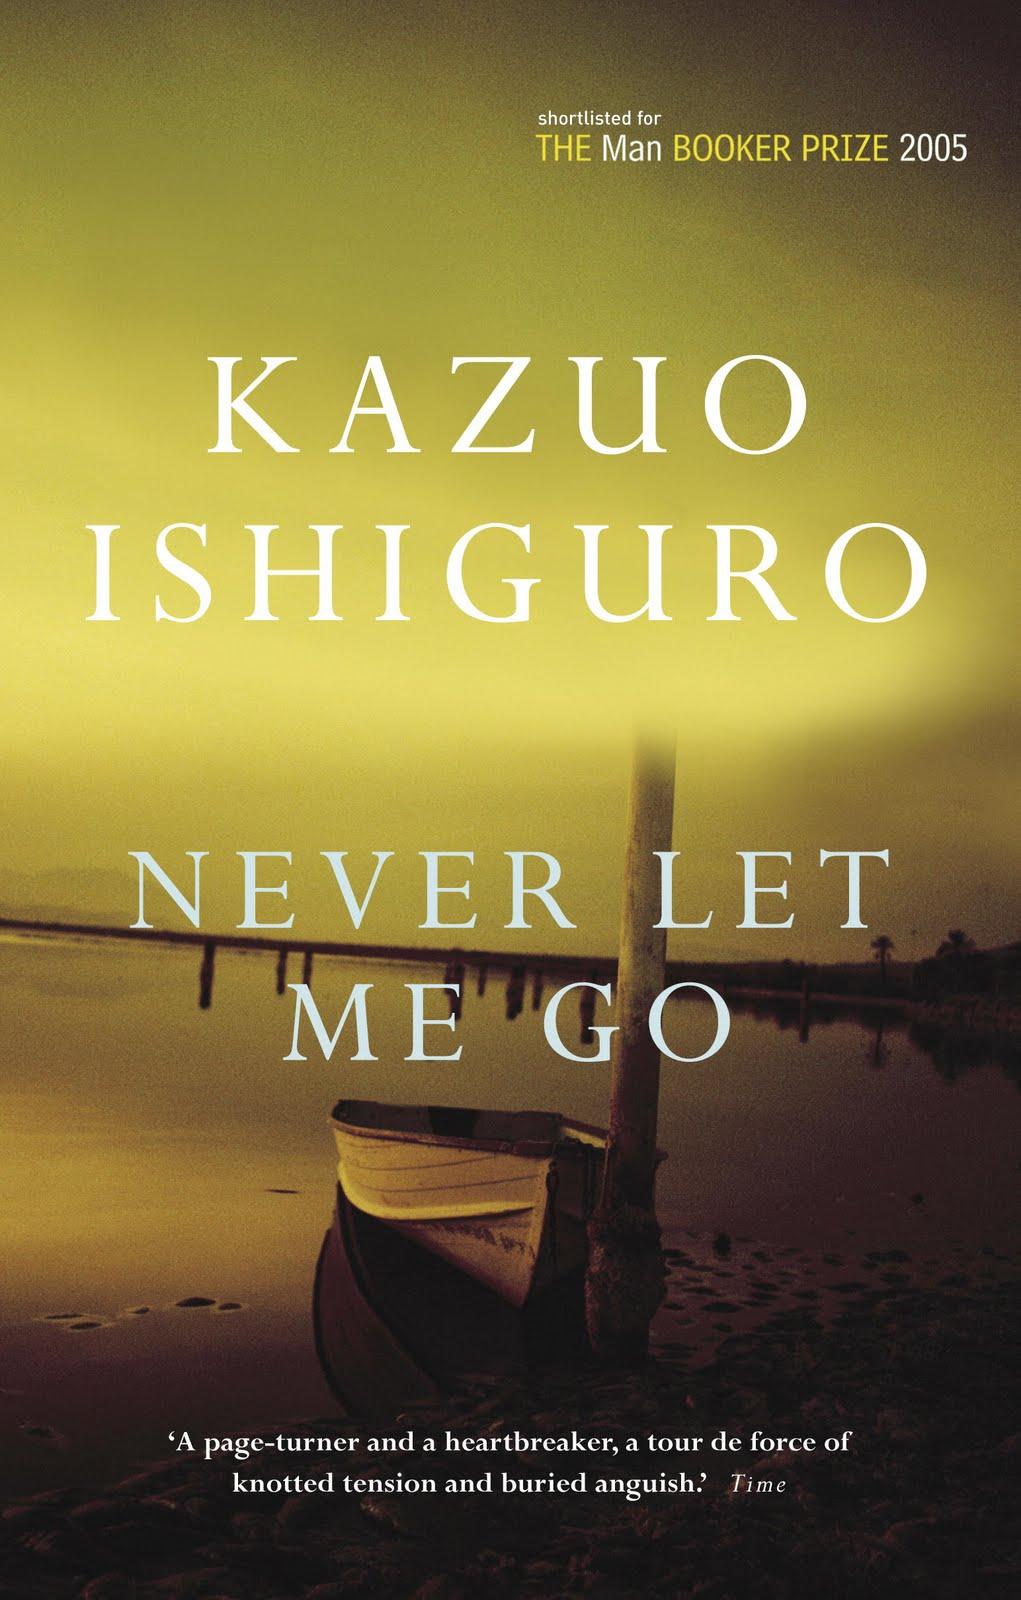 Cinema, Fiction And Kazuo Ishiguro